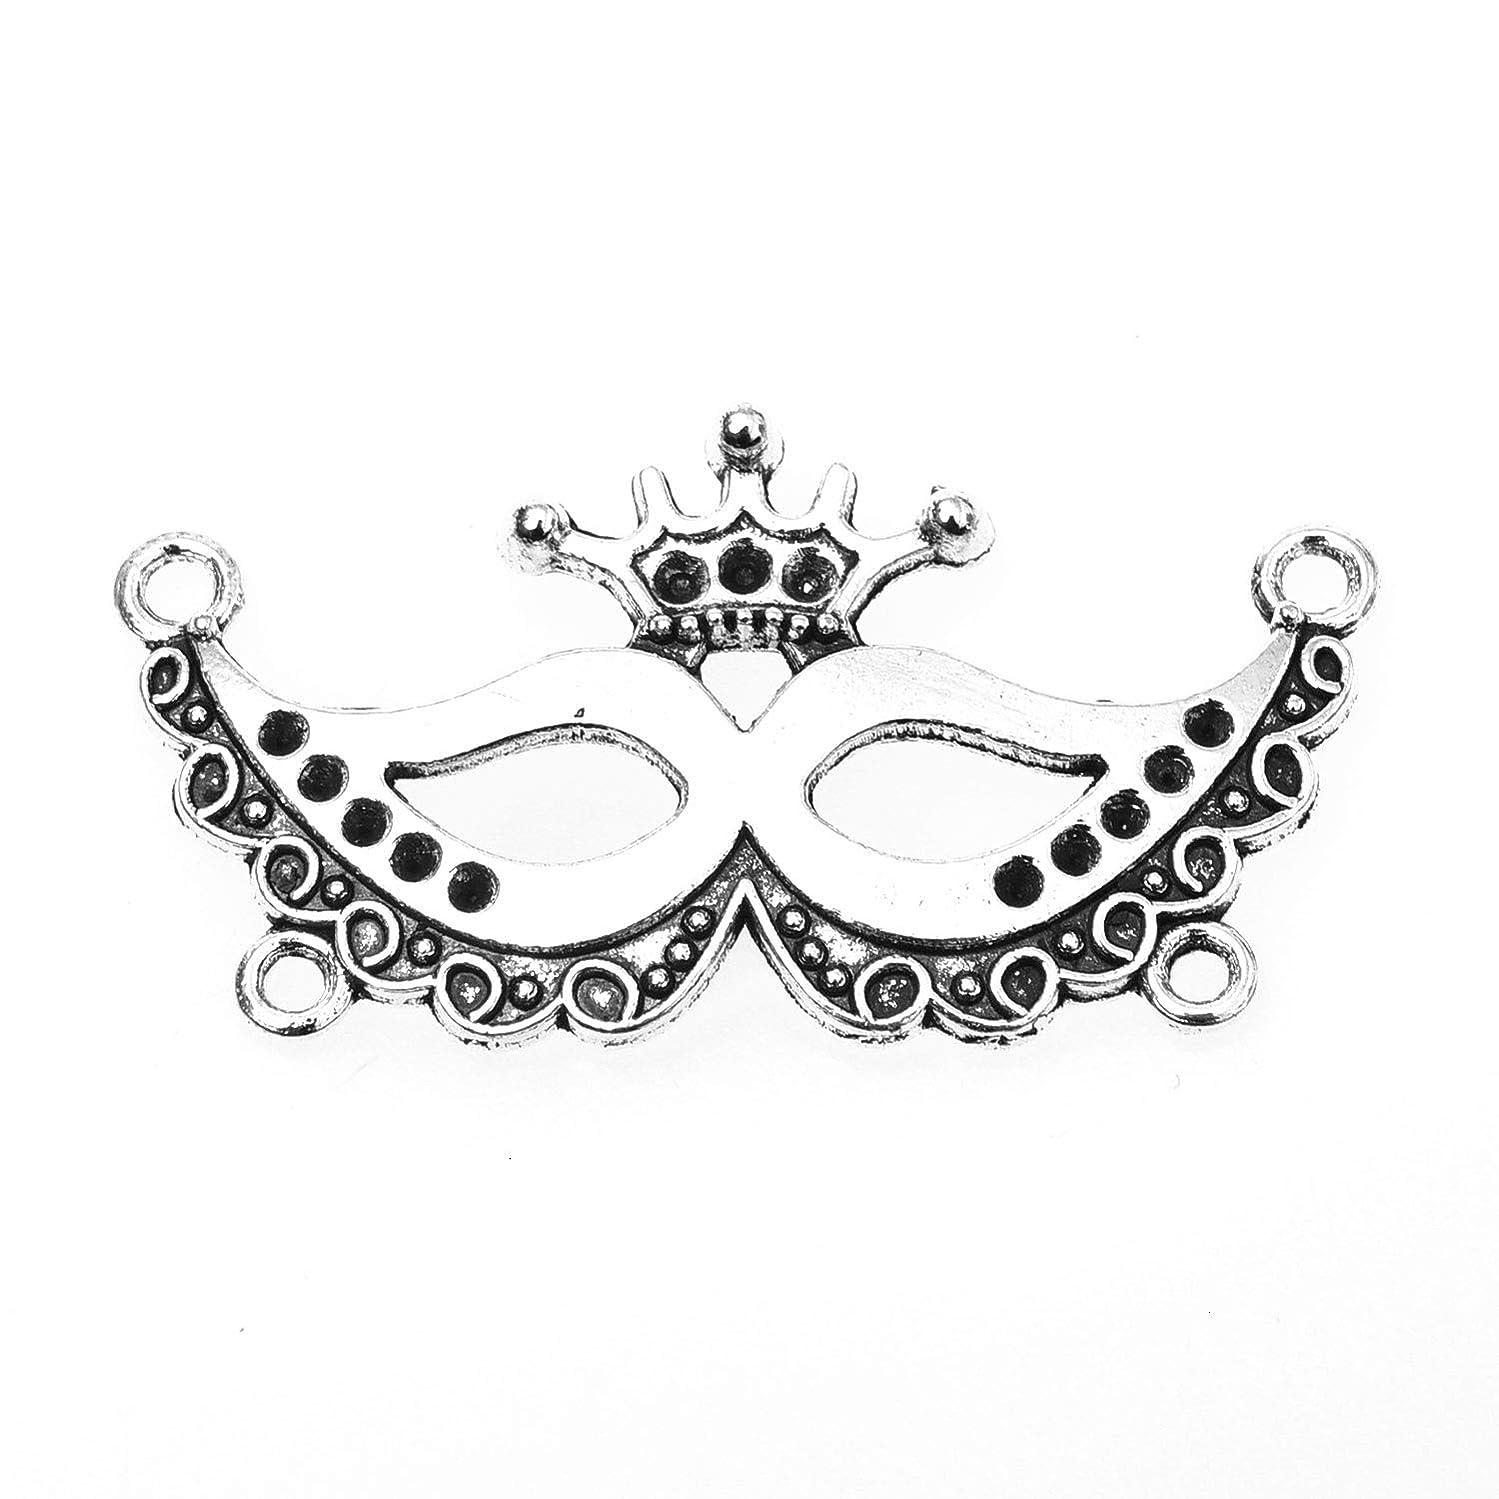 Monrocco 30 pcs Silver Alloy Mask Charms Pendant Party mask Masquerade Mardi gras Zinc Alloy Pendant